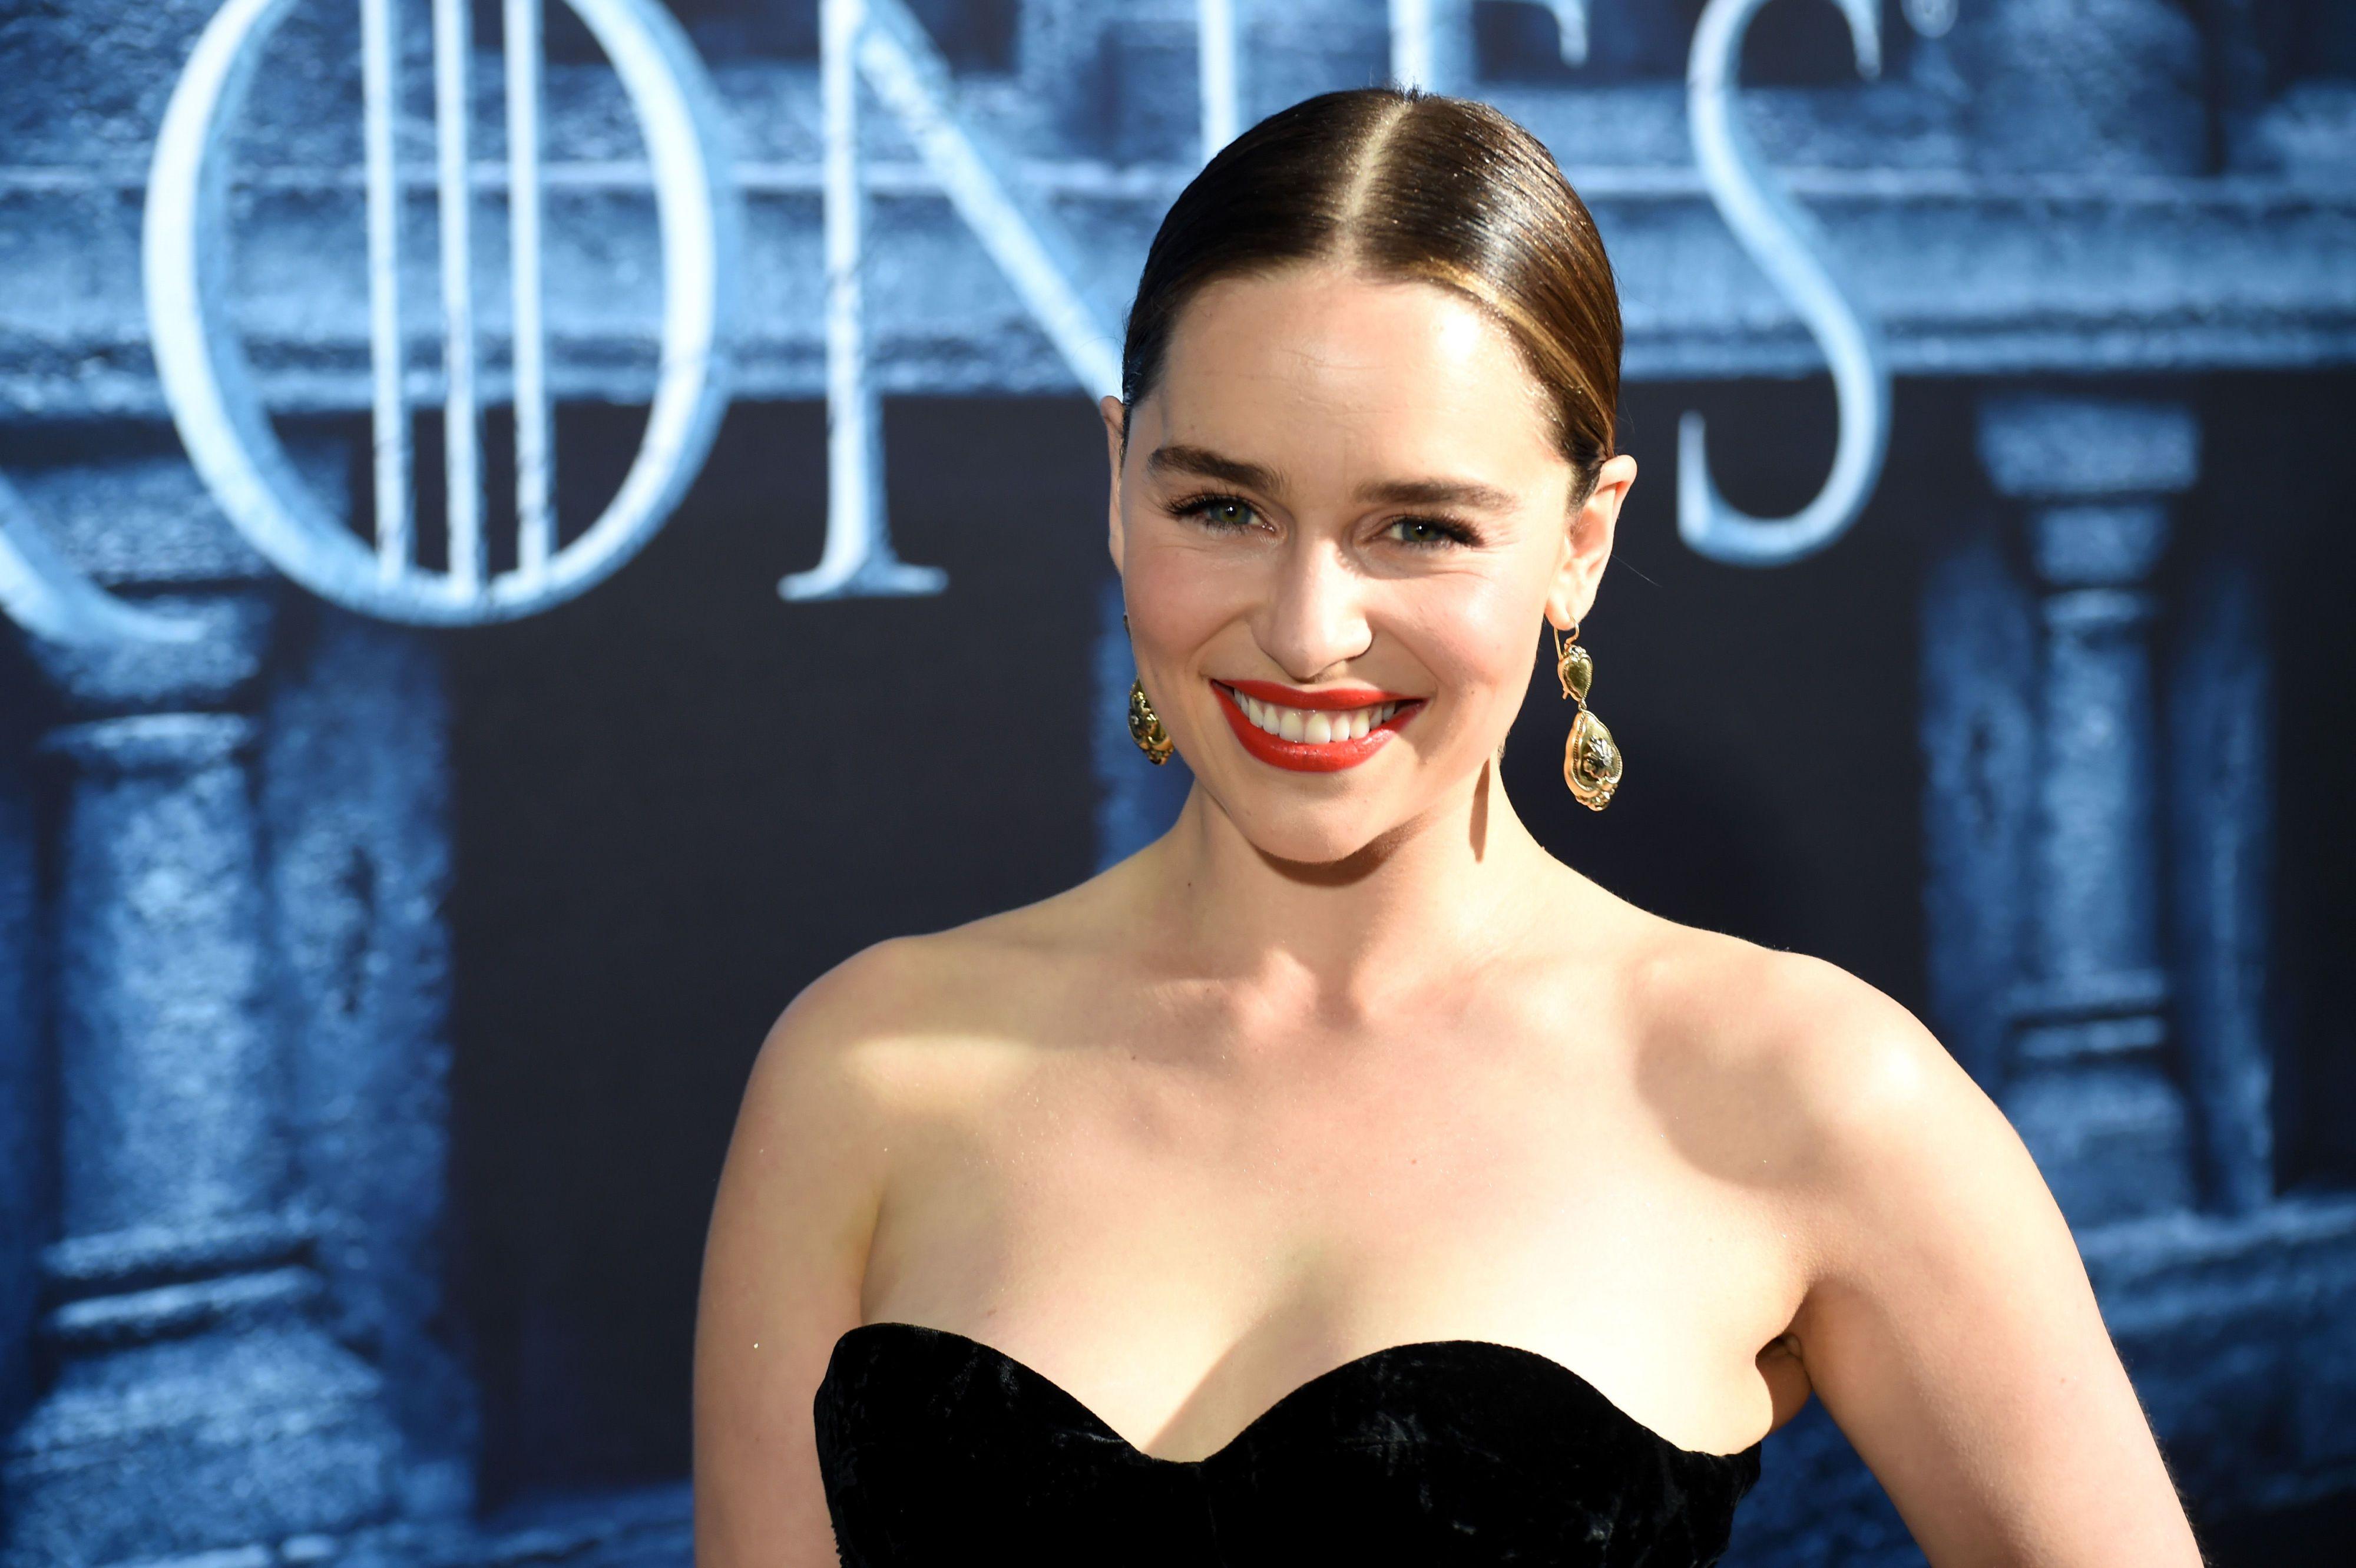 Emilia clarke seks videa